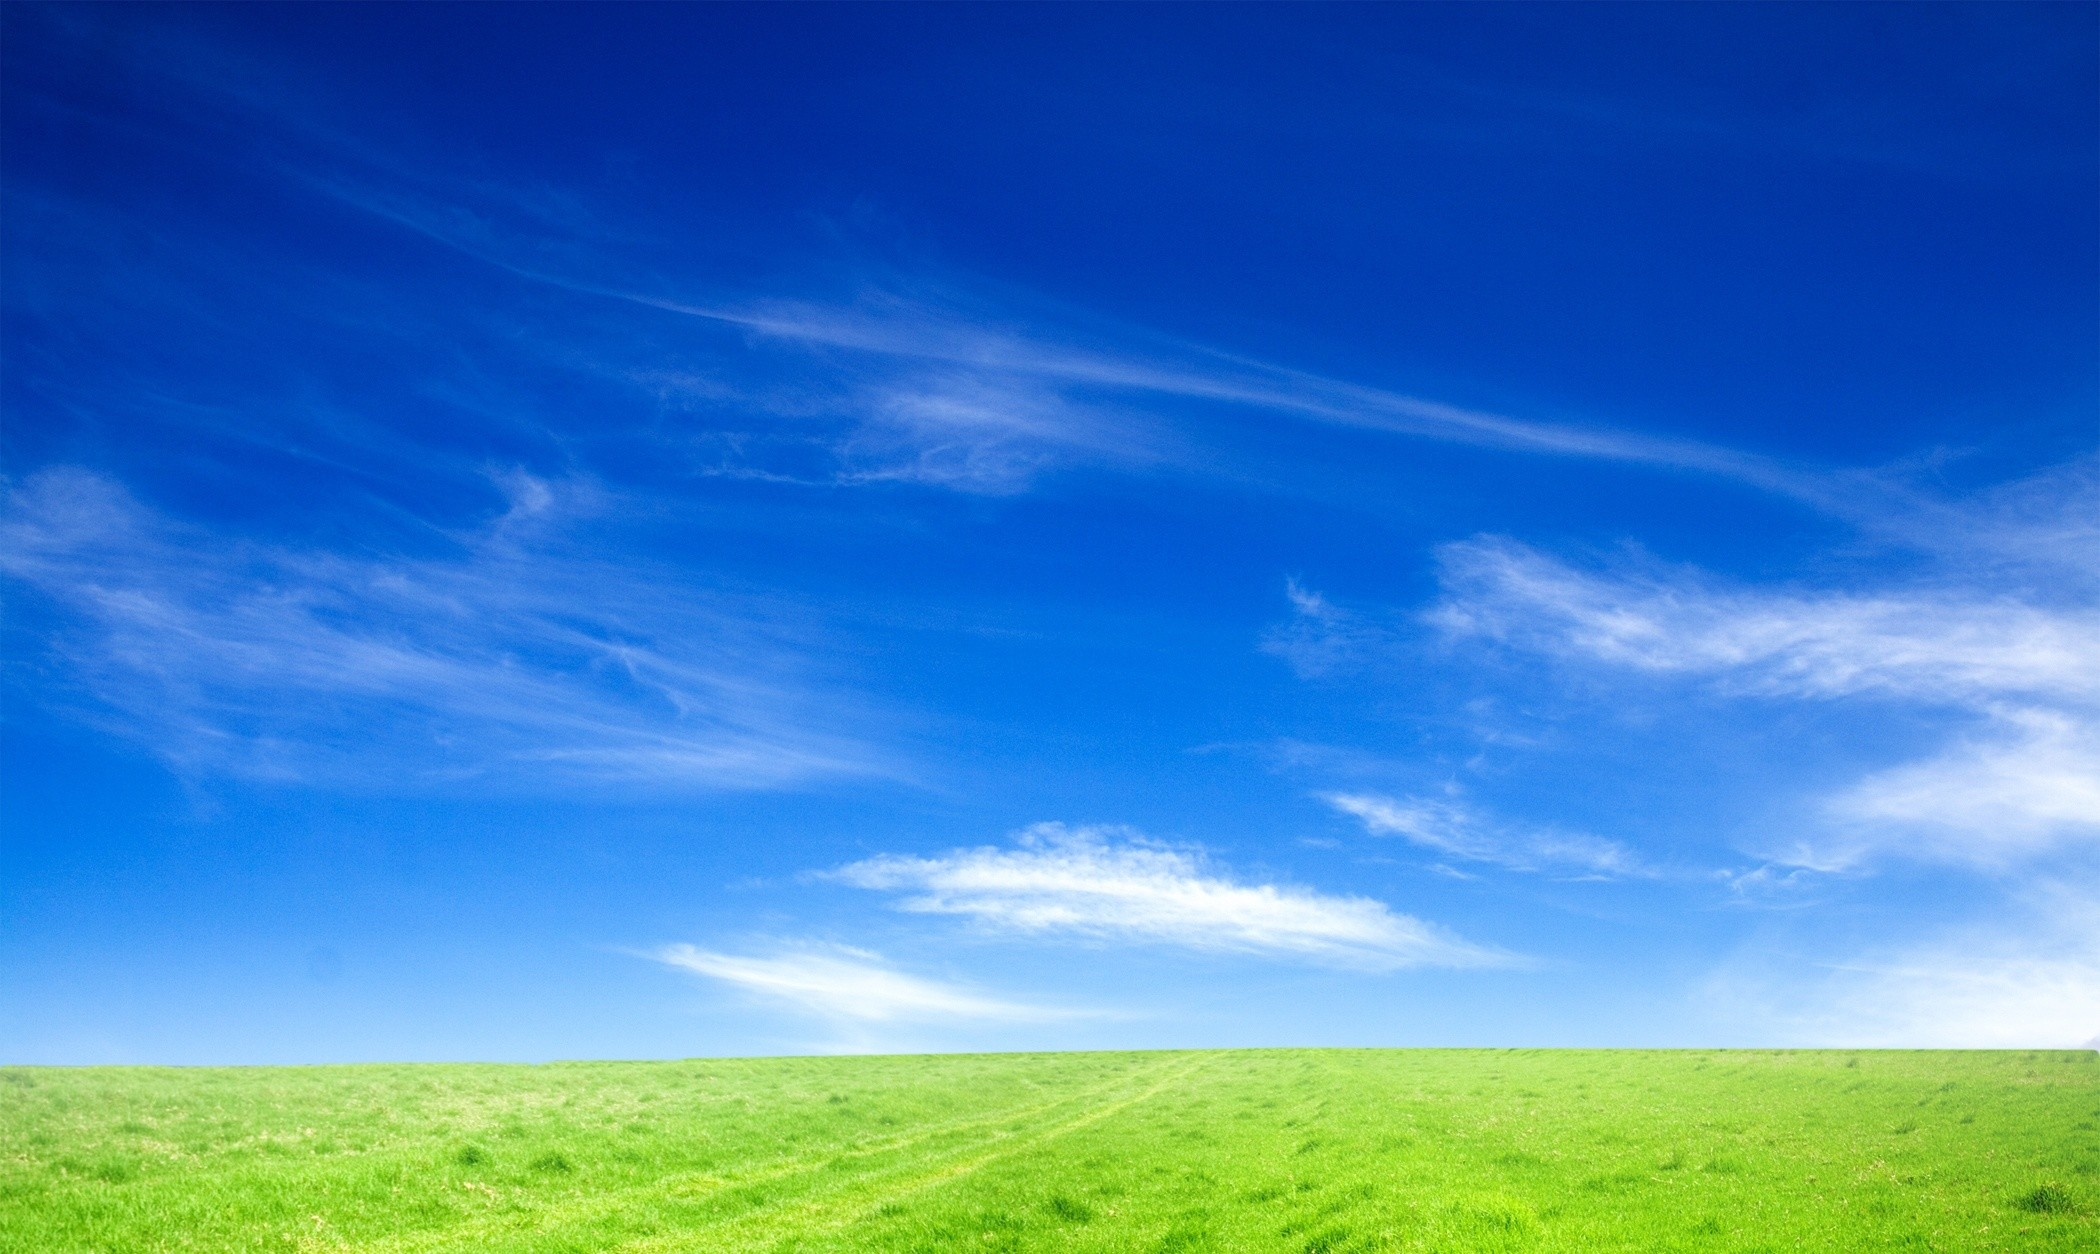 Best 25 Blue Sky Clouds ideas on Pinterest | Cloud ceiling, Sky .